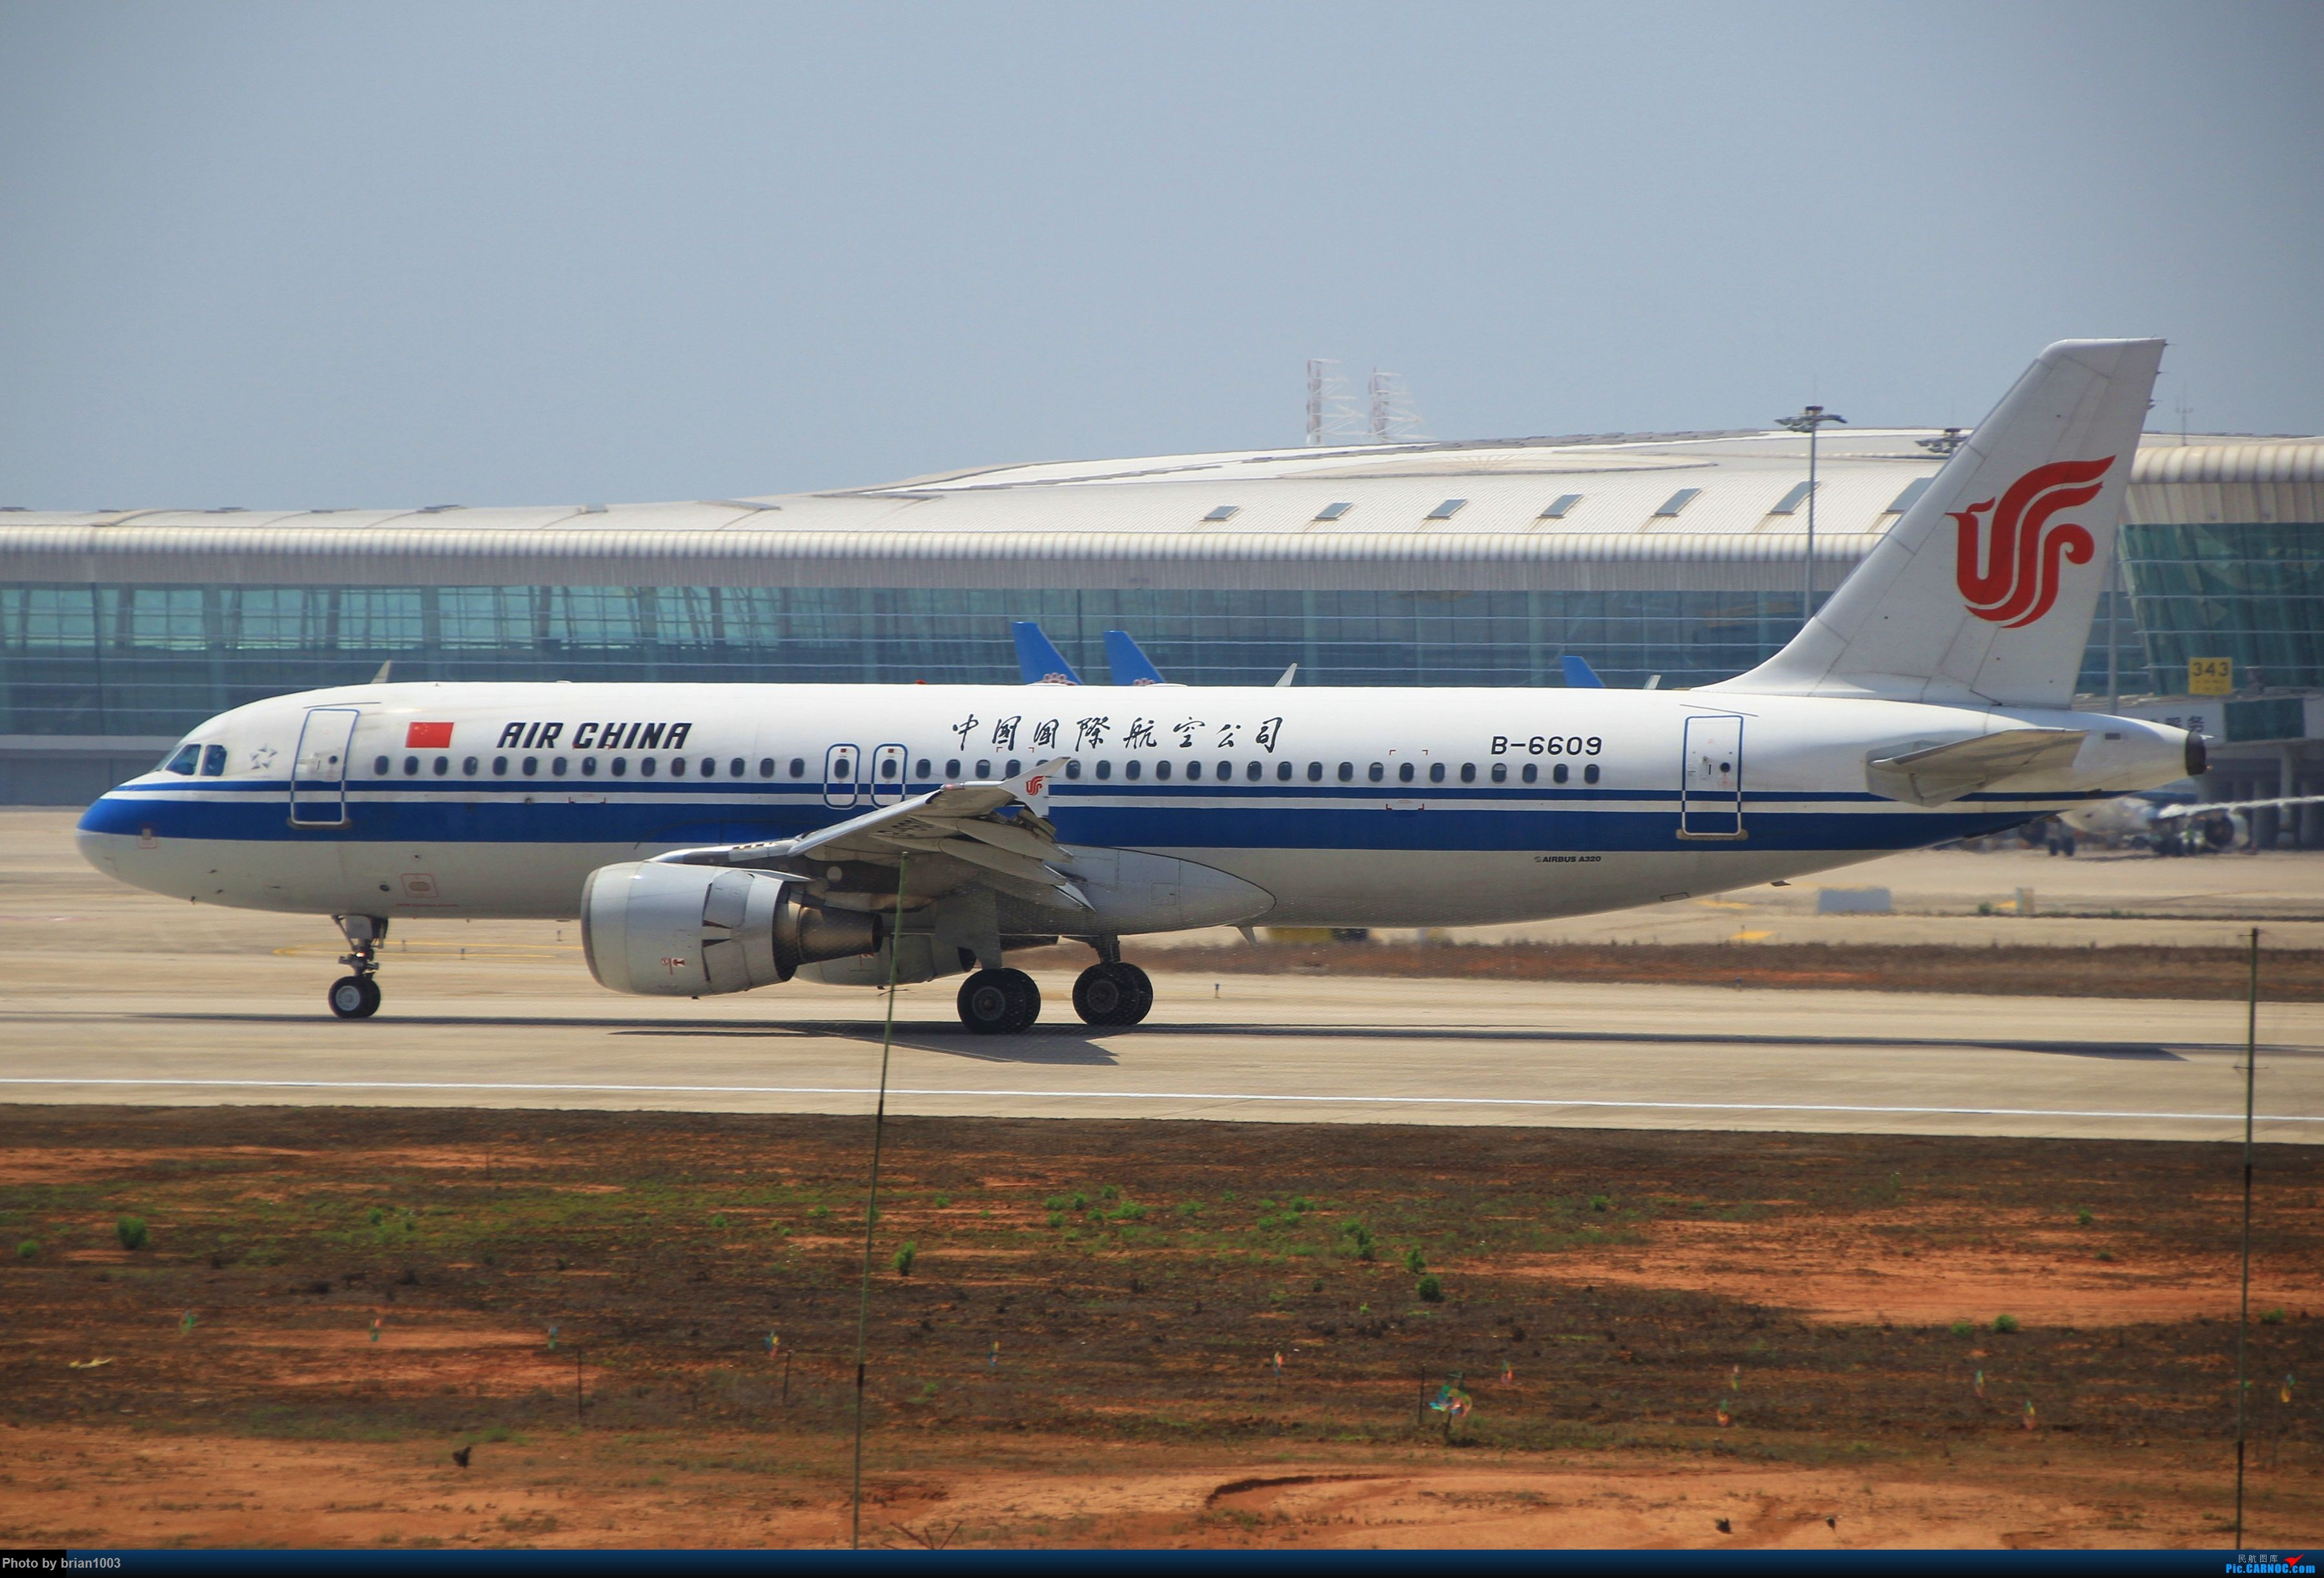 Re:[原创]WUH武汉天河机场拍机之喜迎酷航788和偶遇某其他飞机 AIRBUS A320-200 B-6609